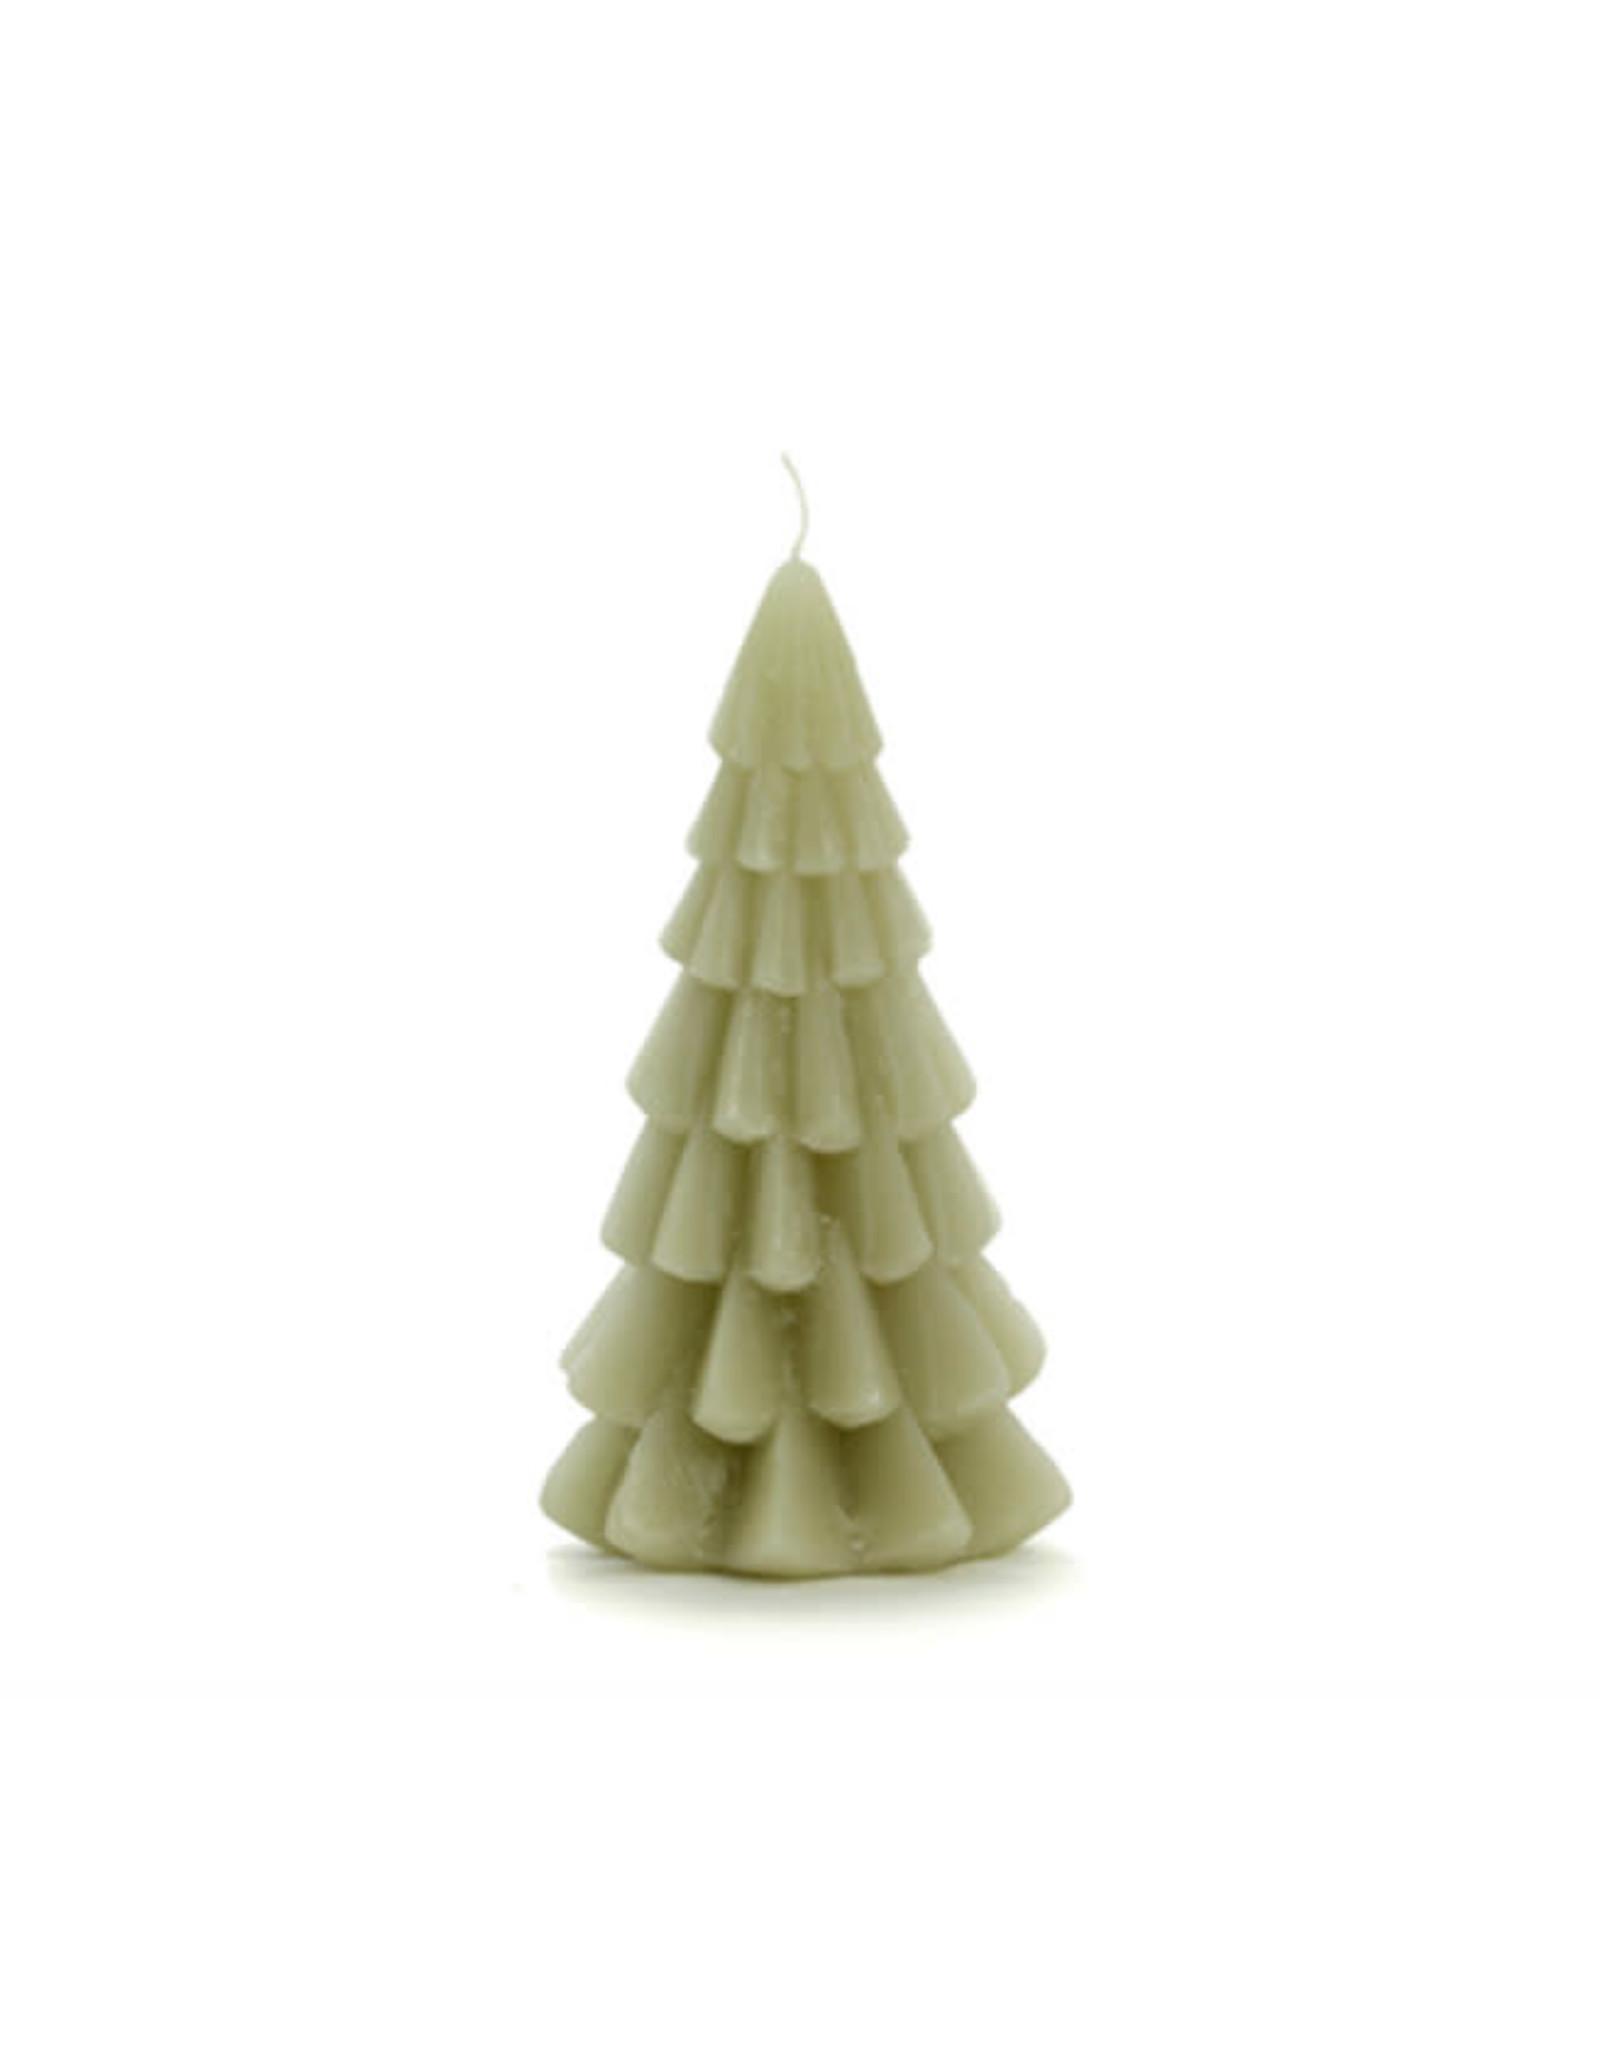 Rustik Lys Xmas Tree Candle 6x12cm-eucalyptus